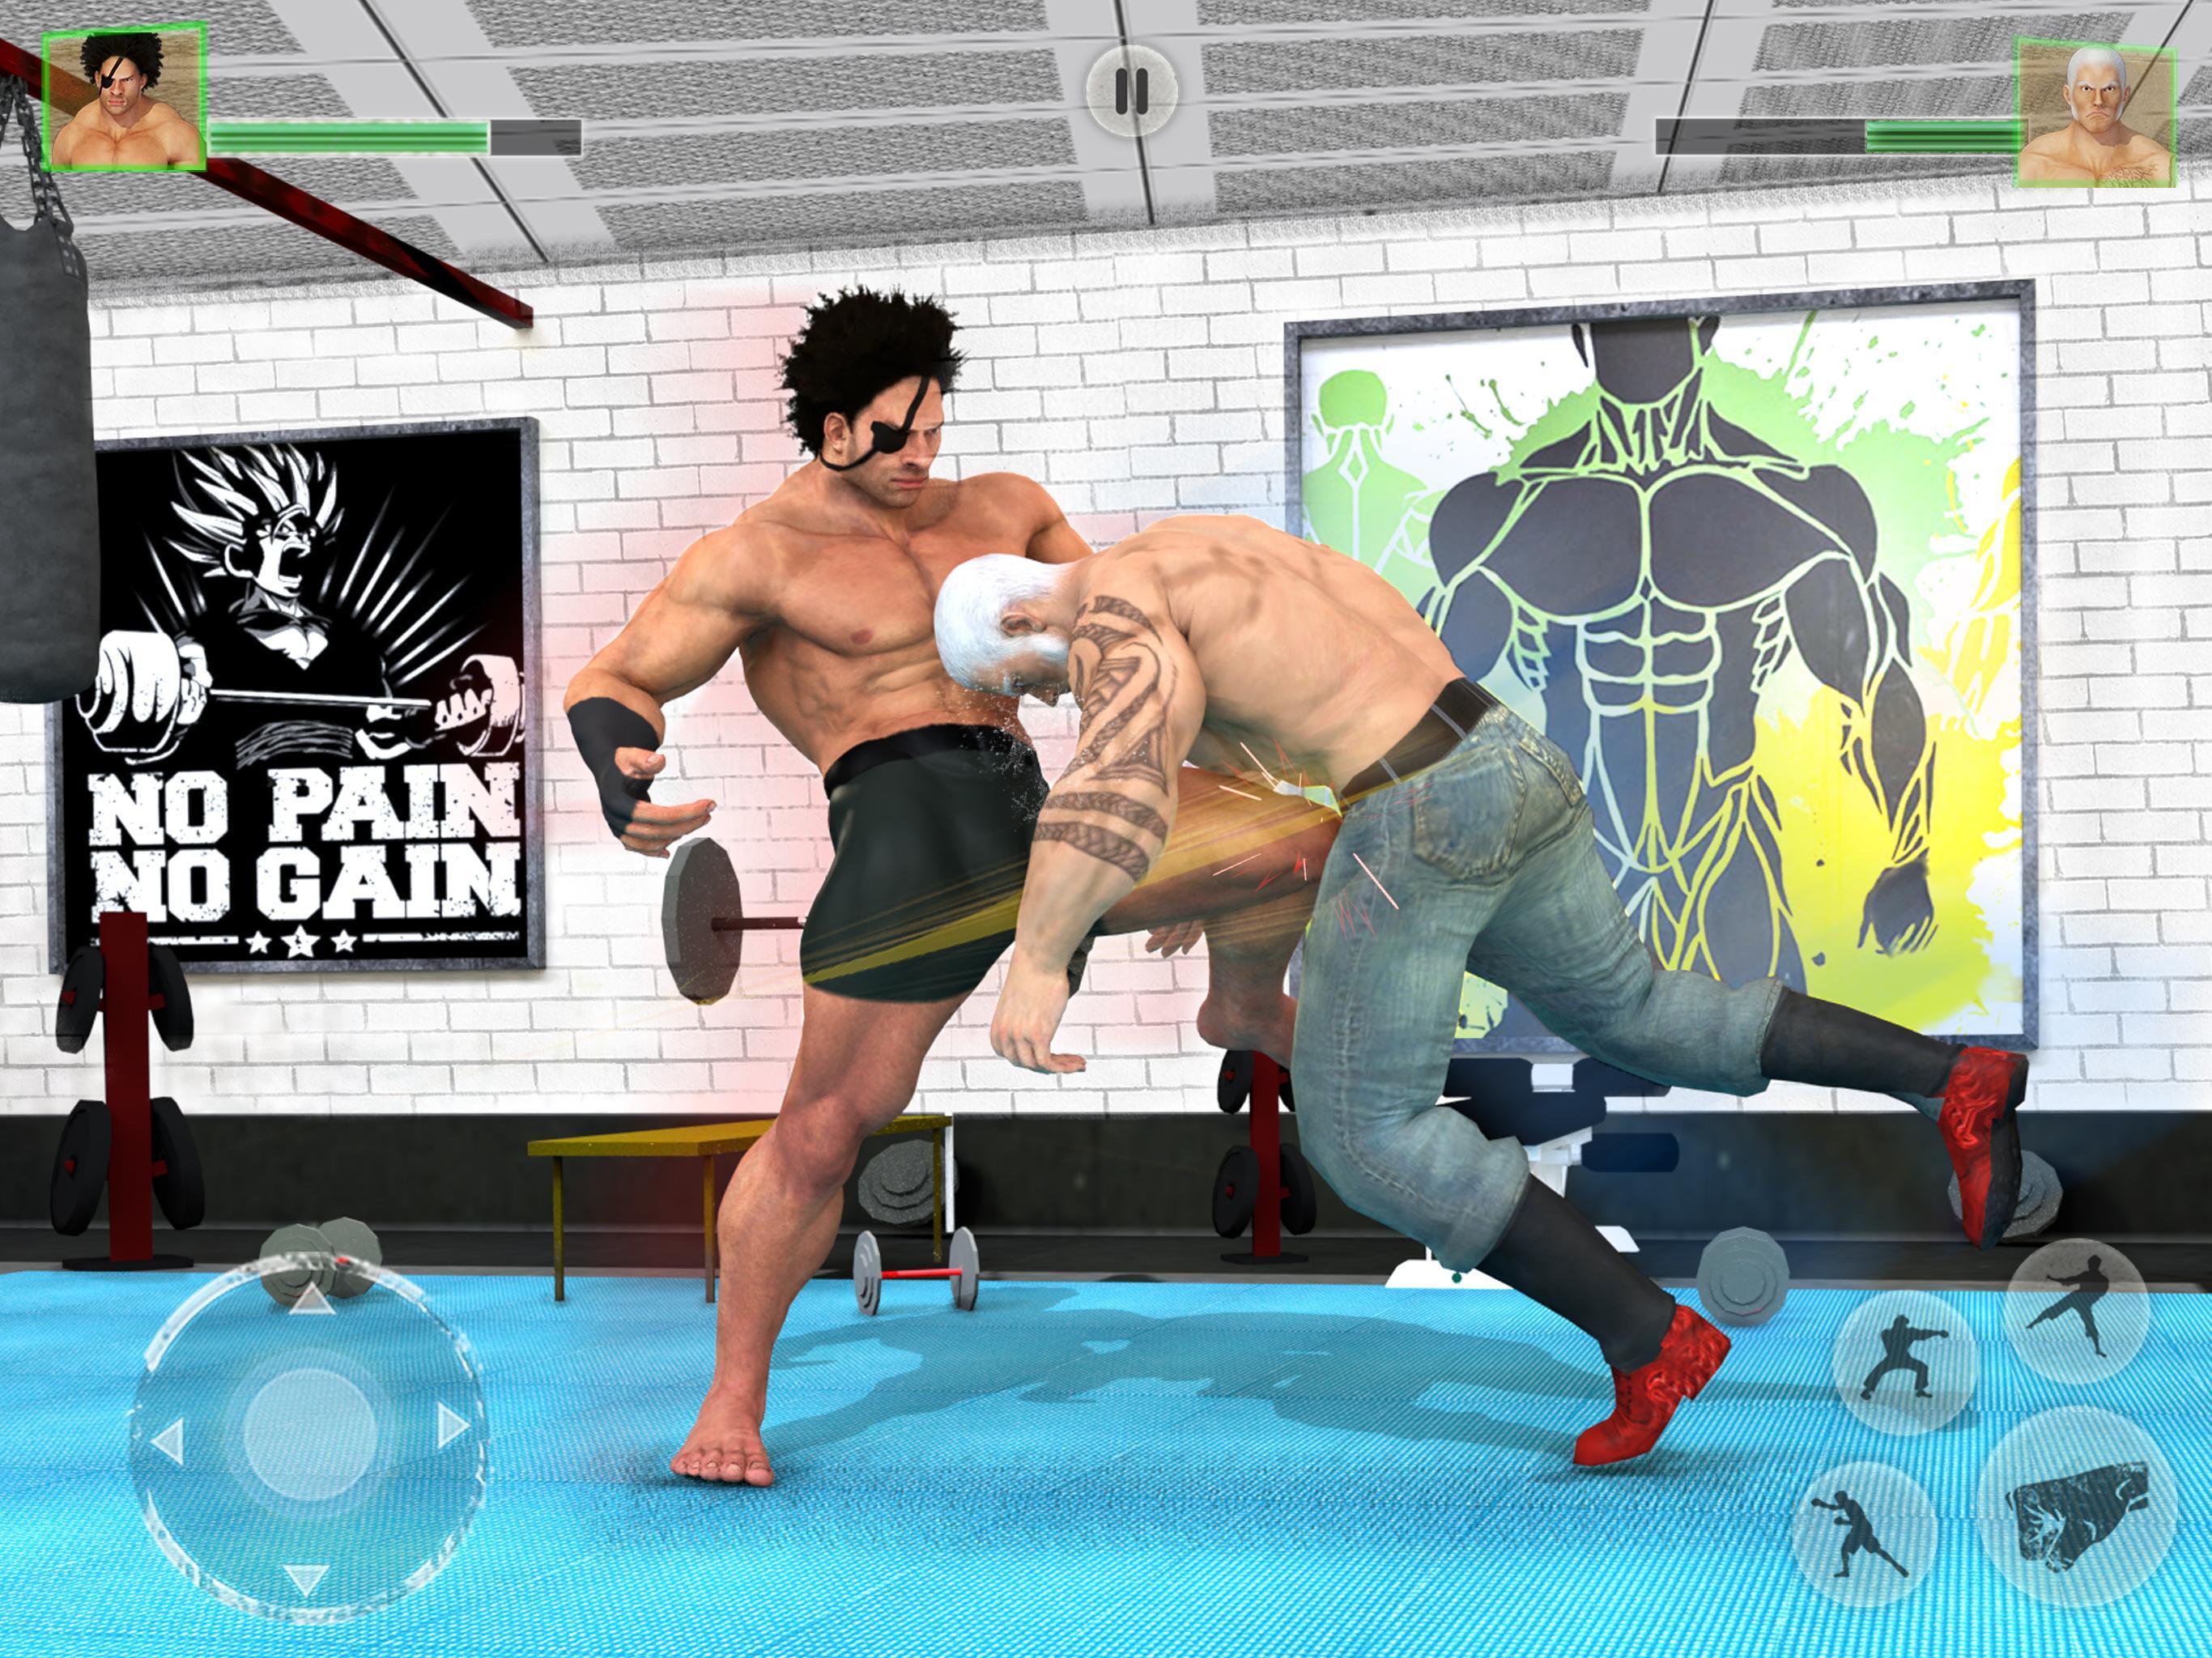 Bodybuilder Fighting Club 2019: Wrestling Games 1.1.4 Screenshot 11